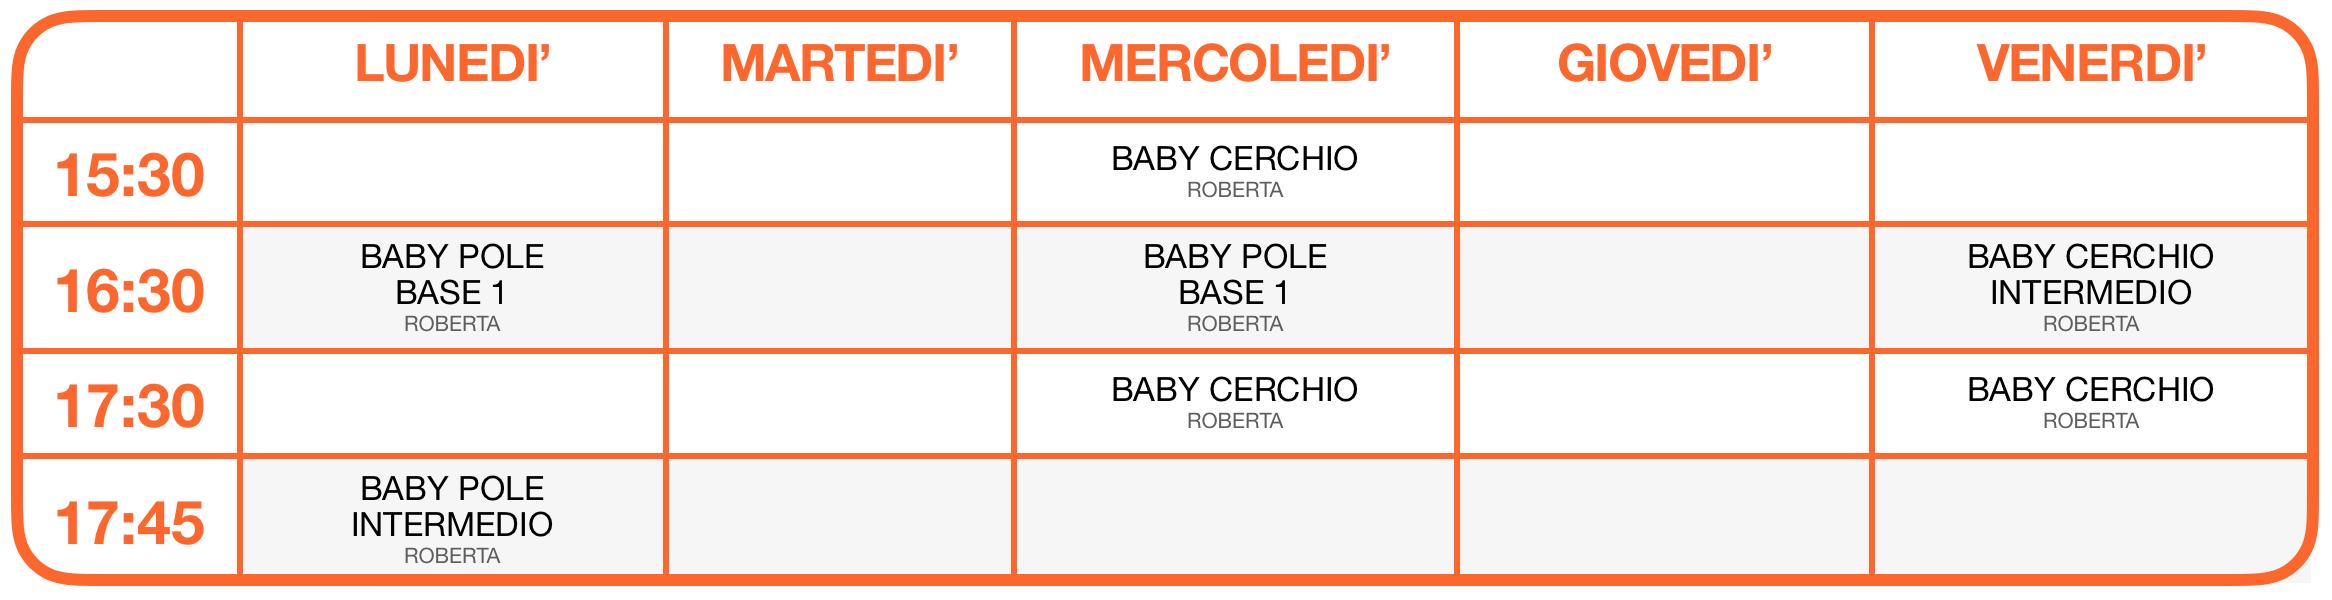 Calendario attività Baby Vertical - Baby Pole Dance e Baby Cerchio Aereo 2021-2022 - Colognola, Soave, San Bonifacio, Verona - School of Art®